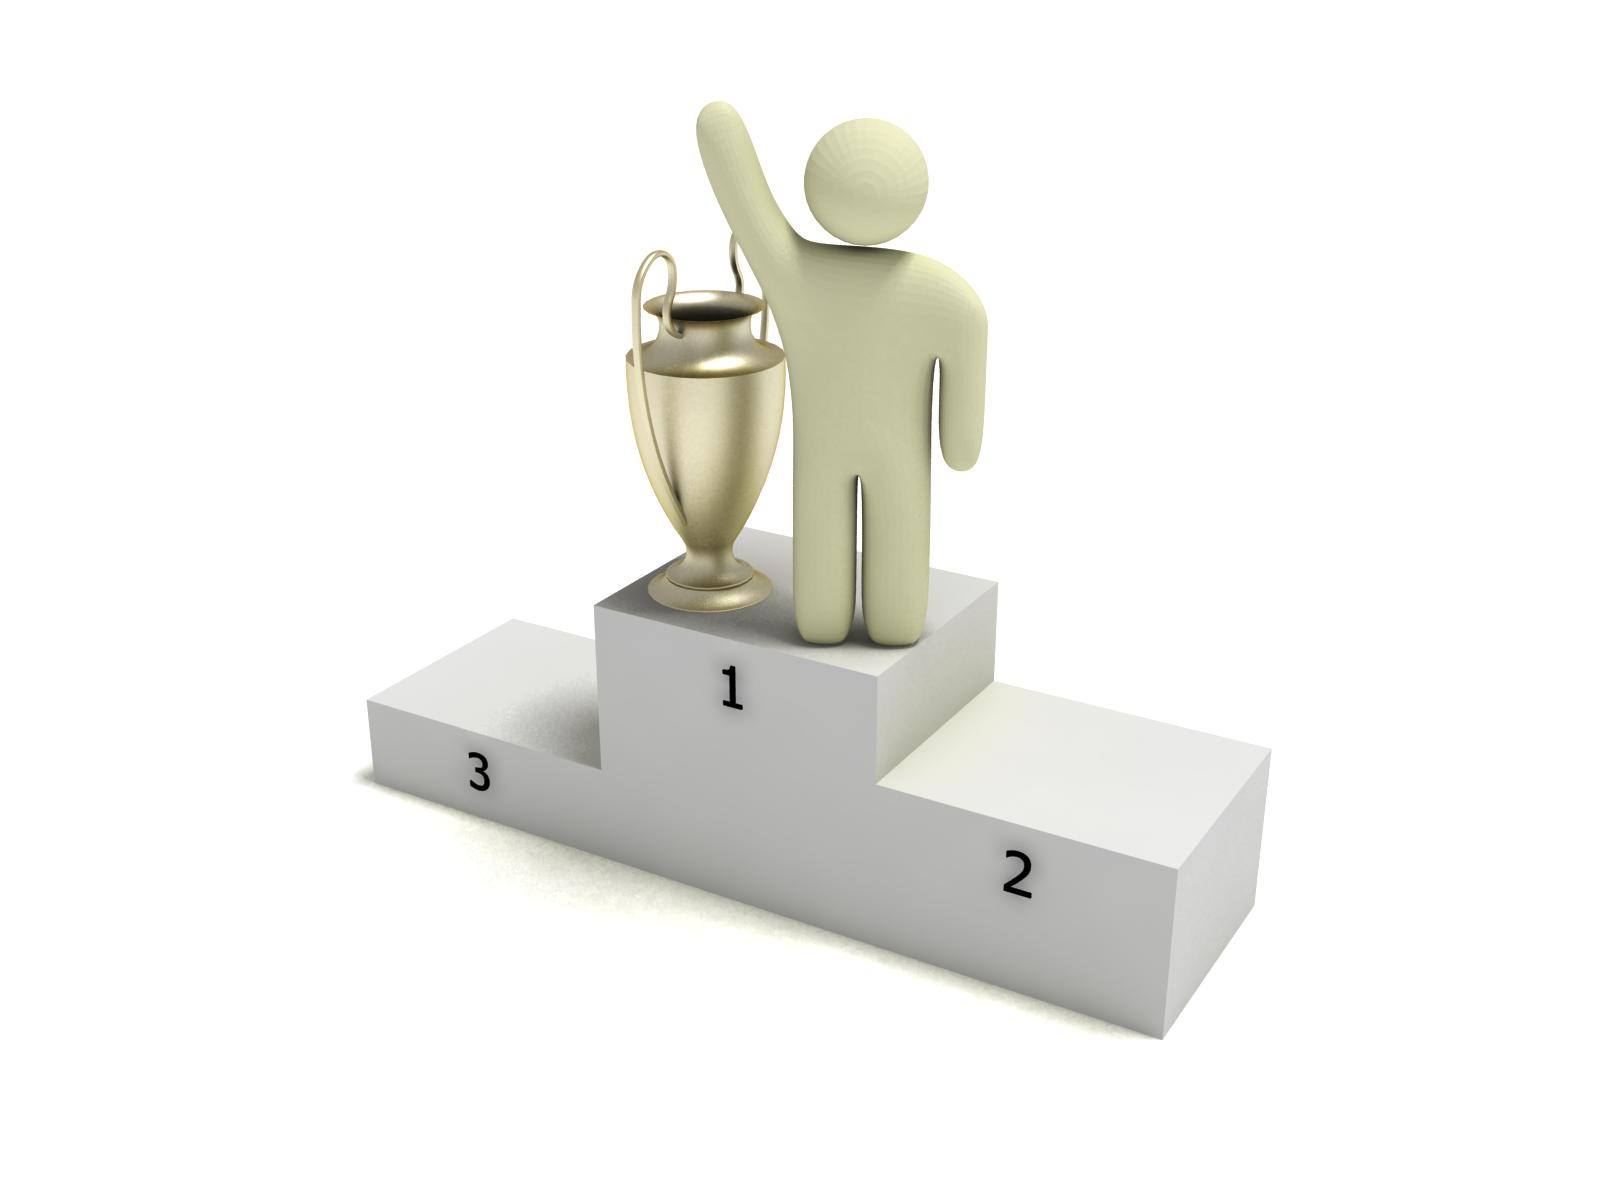 Victory podium - Concurso de Minis Sobre Imagen......